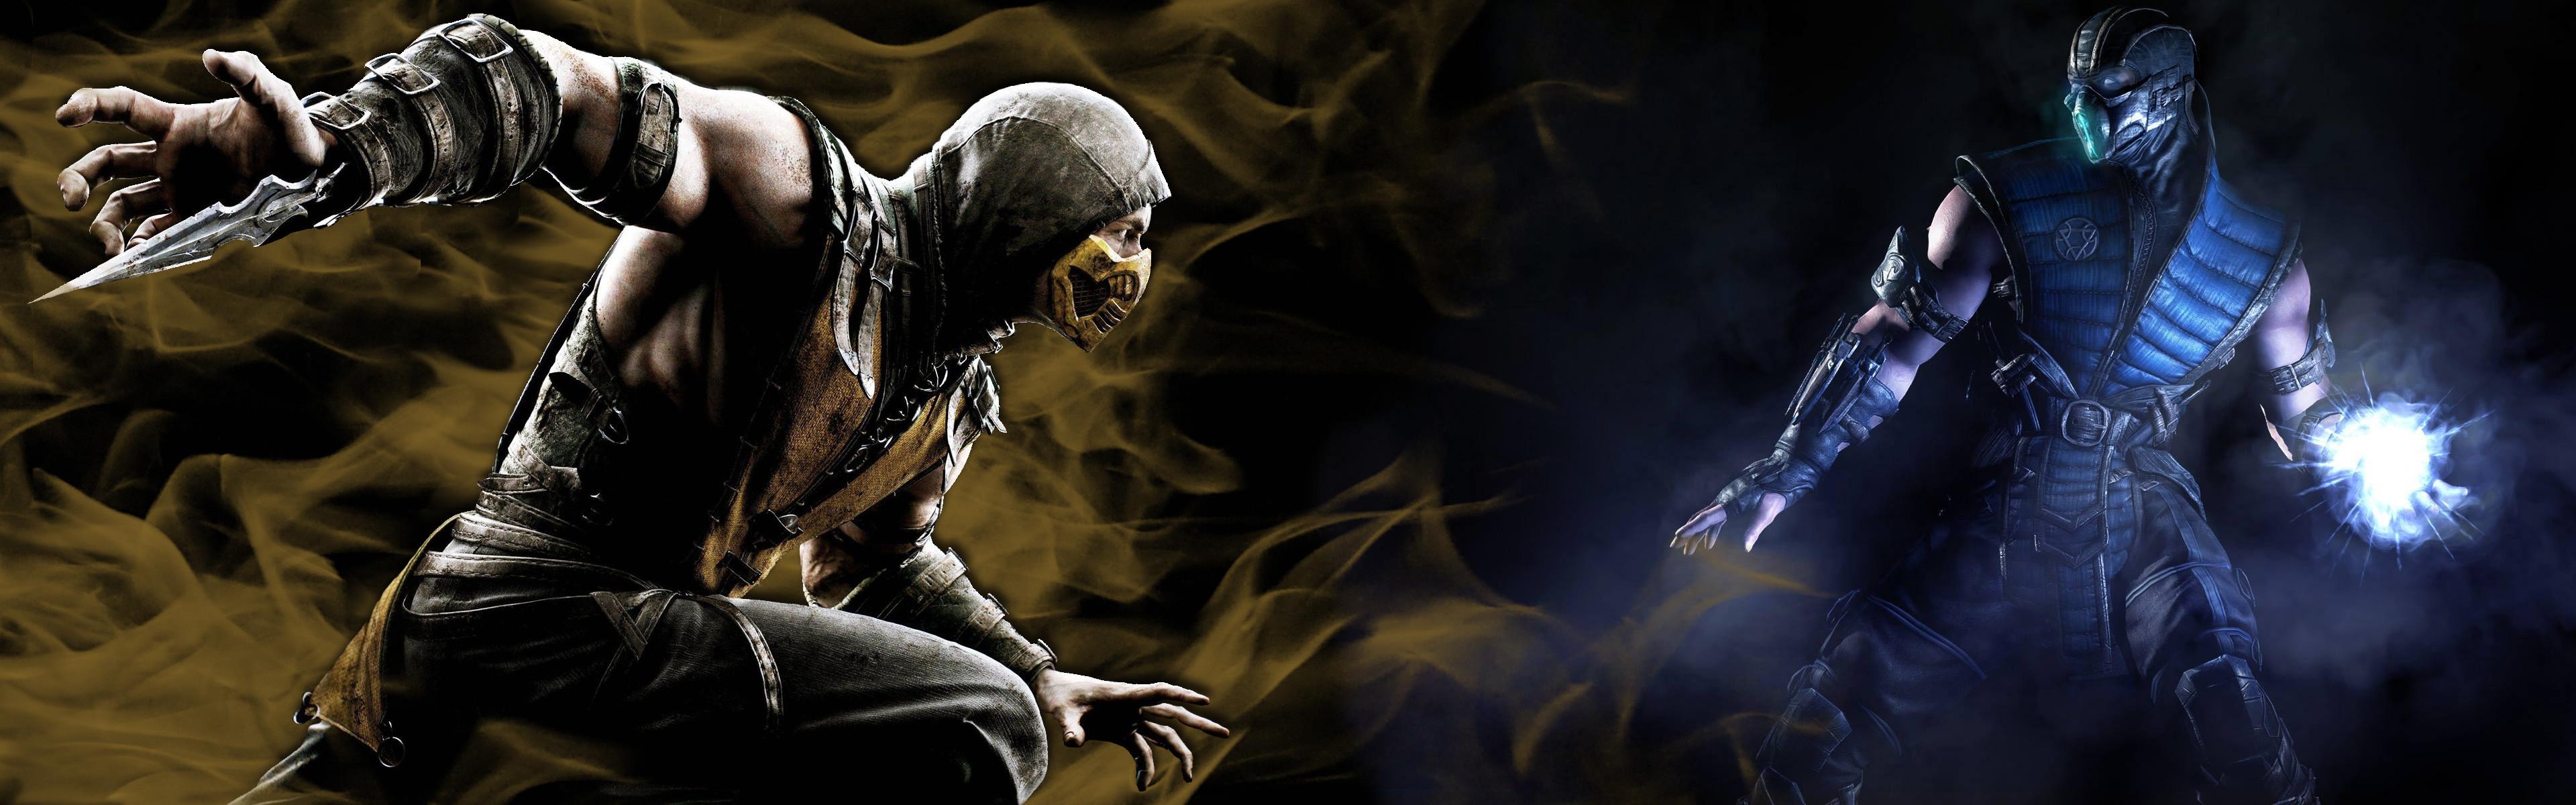 Sub-Zero by Hentiger5544 Mortal Kombat X Background, Scorpion vs. Sub-Zero  by Hentiger5544